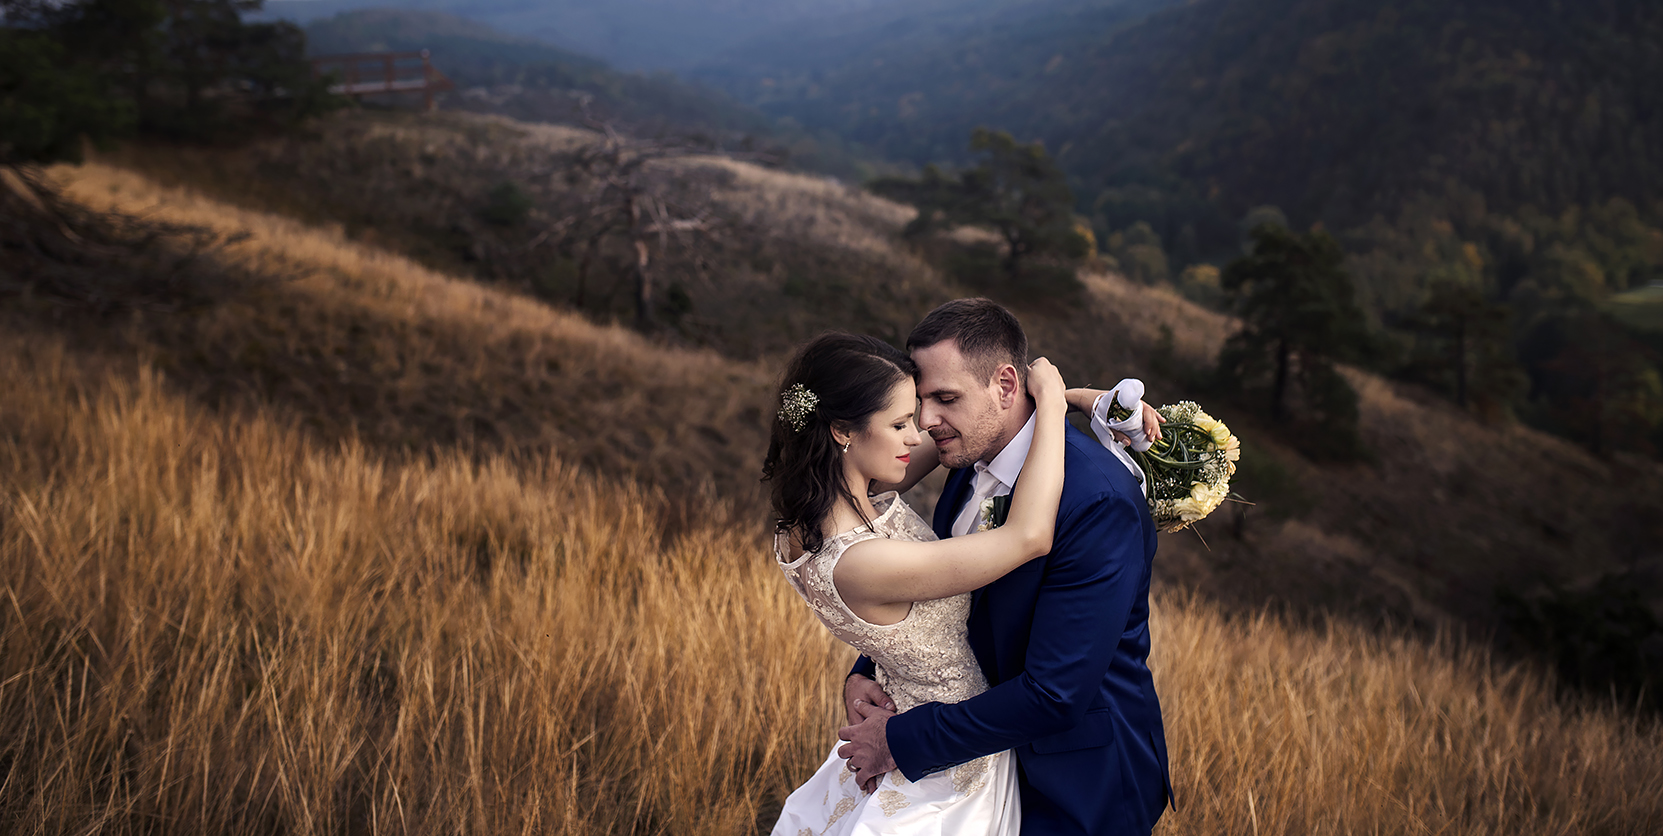 svatební fotograf praha brno